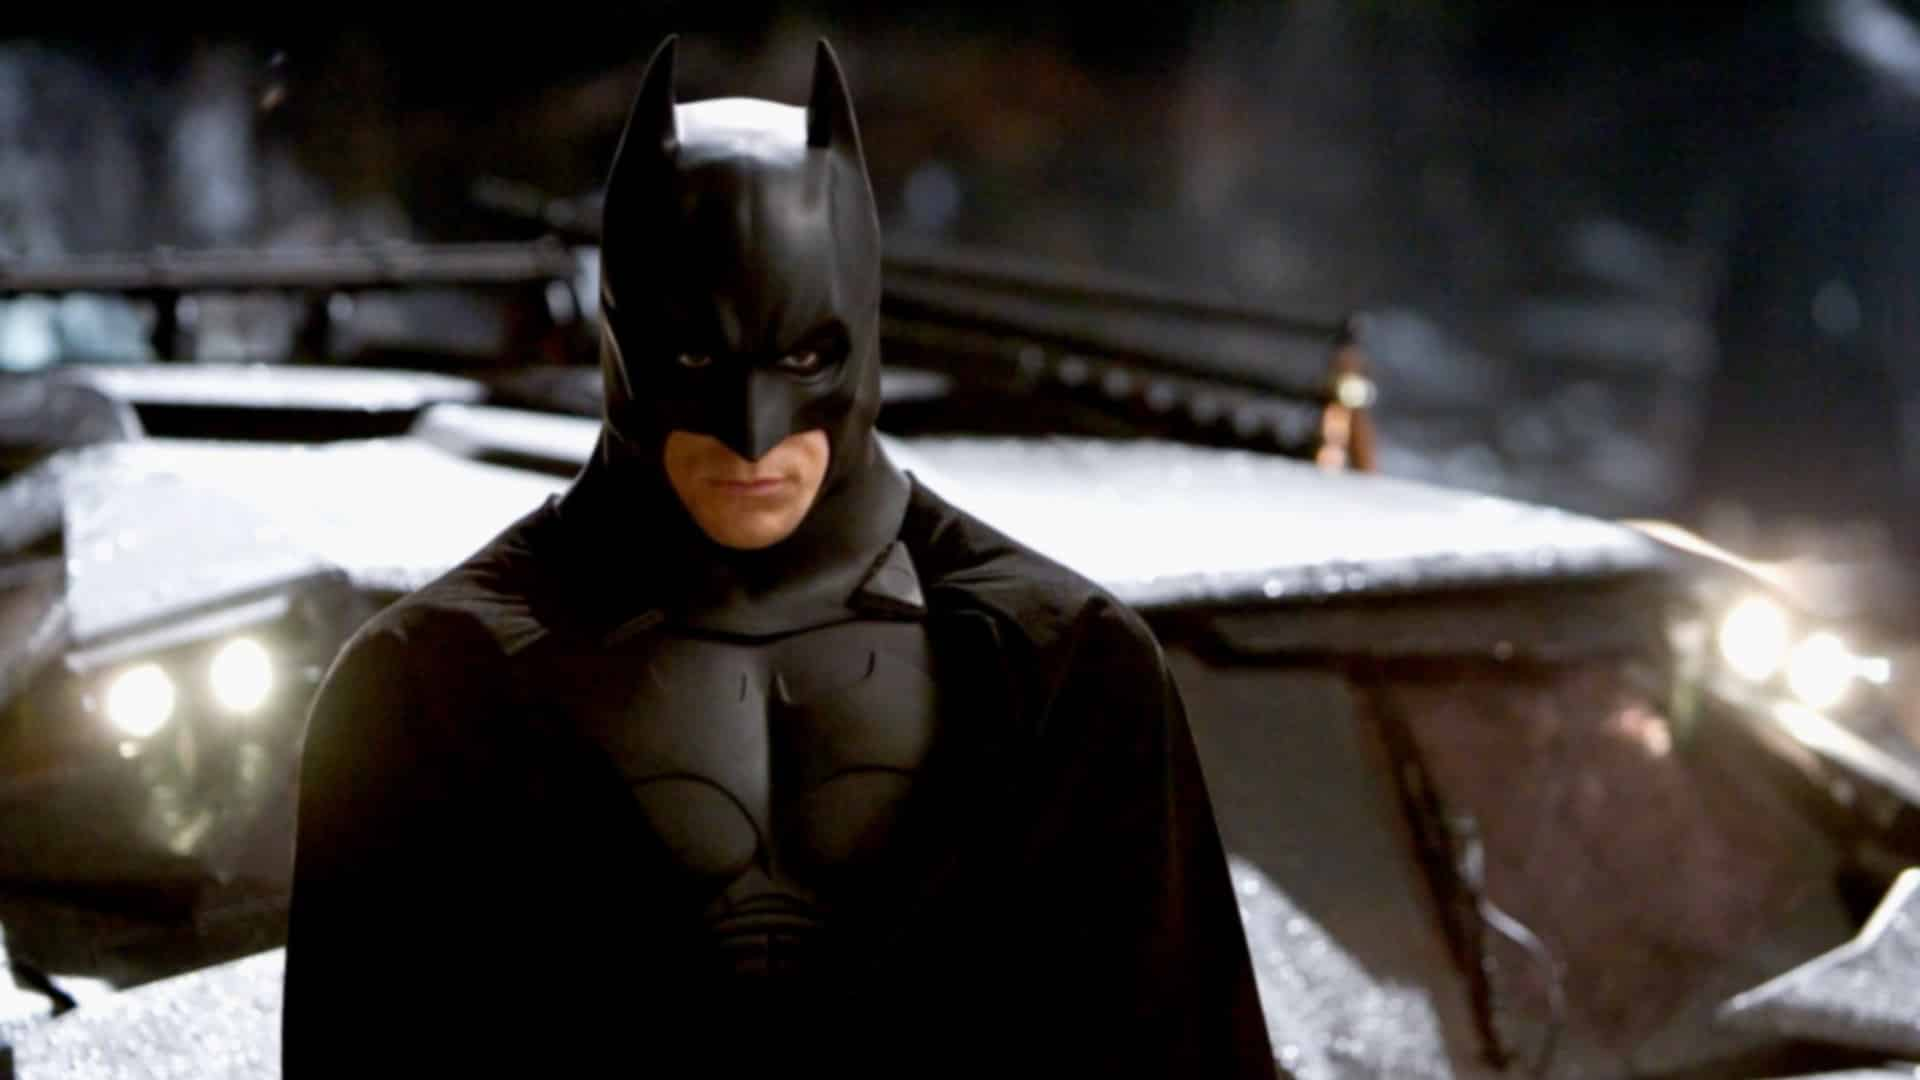 Christian Bale Val Kilmer Batman versatility character different film versions canon Batman Begins